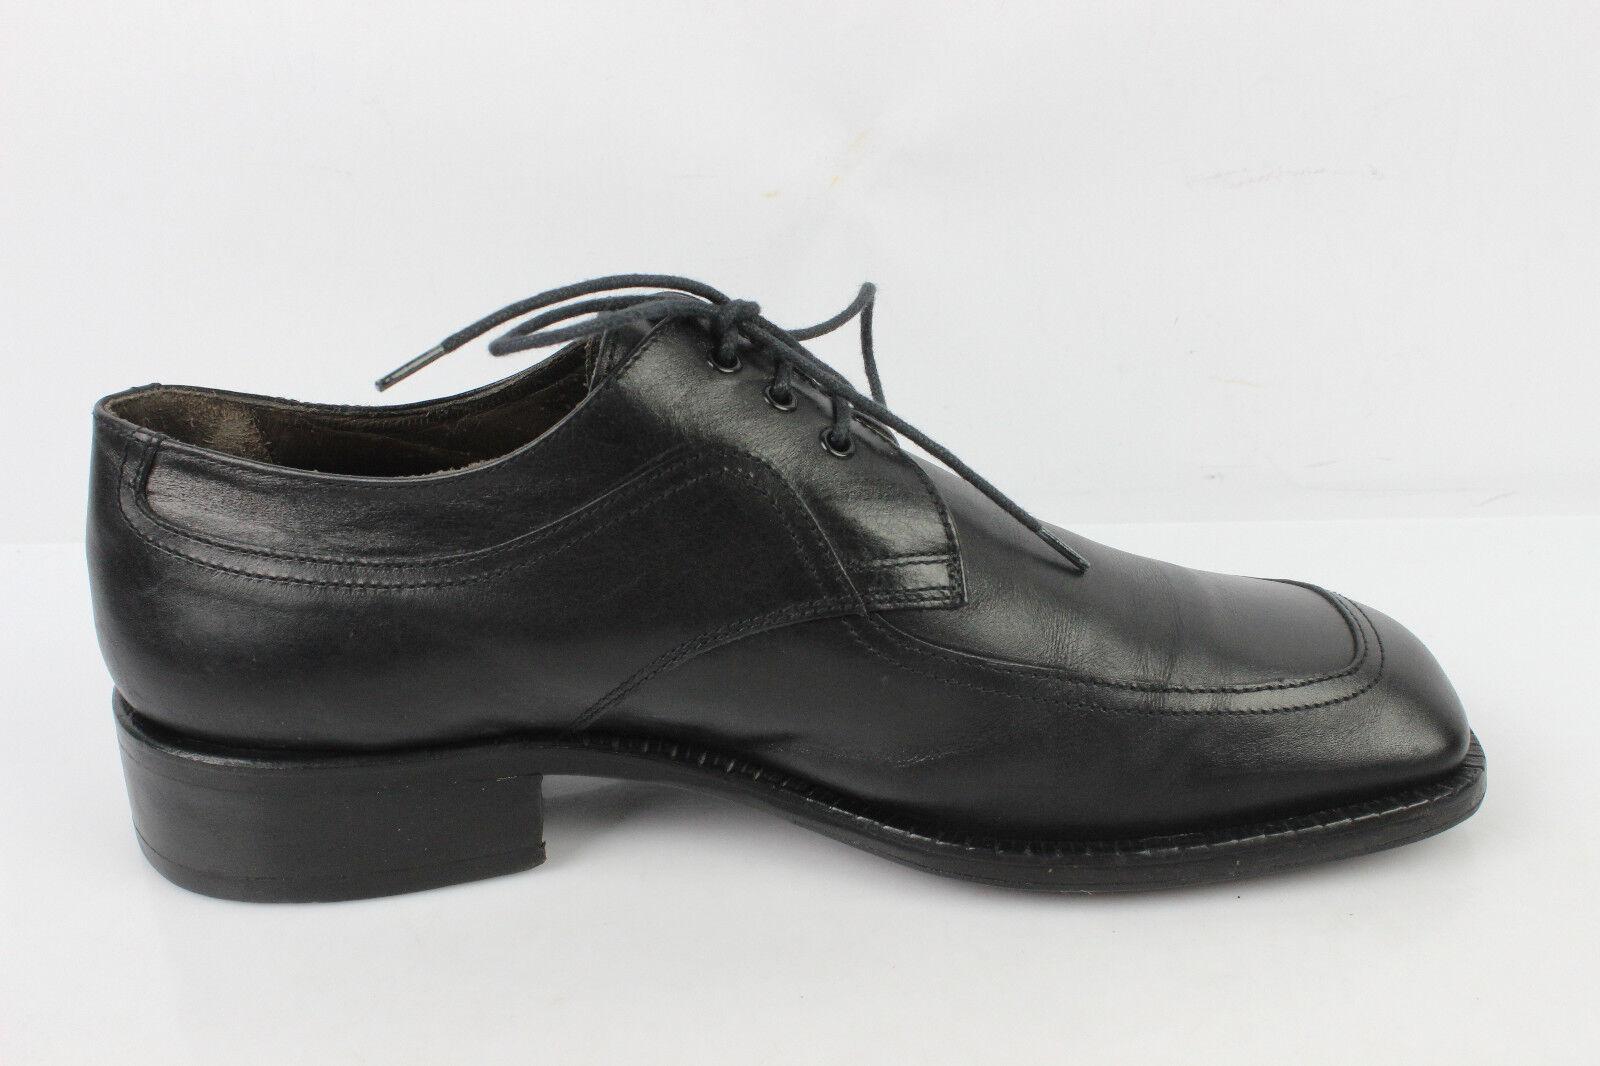 Vintage Oxfordschuhe MONDERER Jeans Claude MONDERER Oxfordschuhe Spitze quadratisch Vollleder a46290